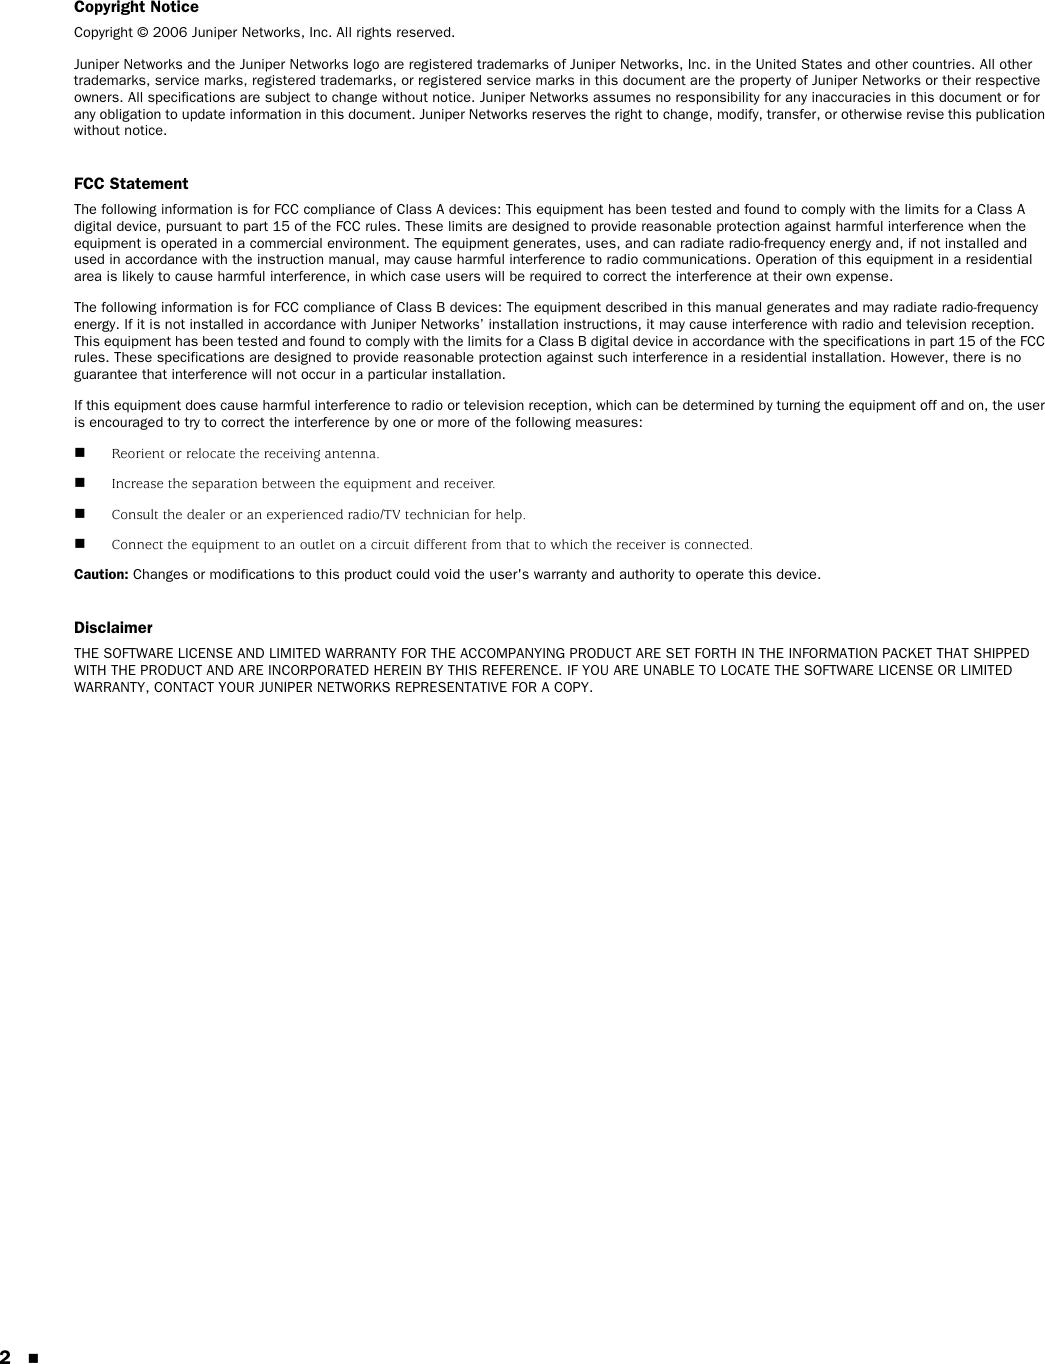 Juniper Networks Secure Services Gateway Ssg 20 Users Manual SSG20_HW